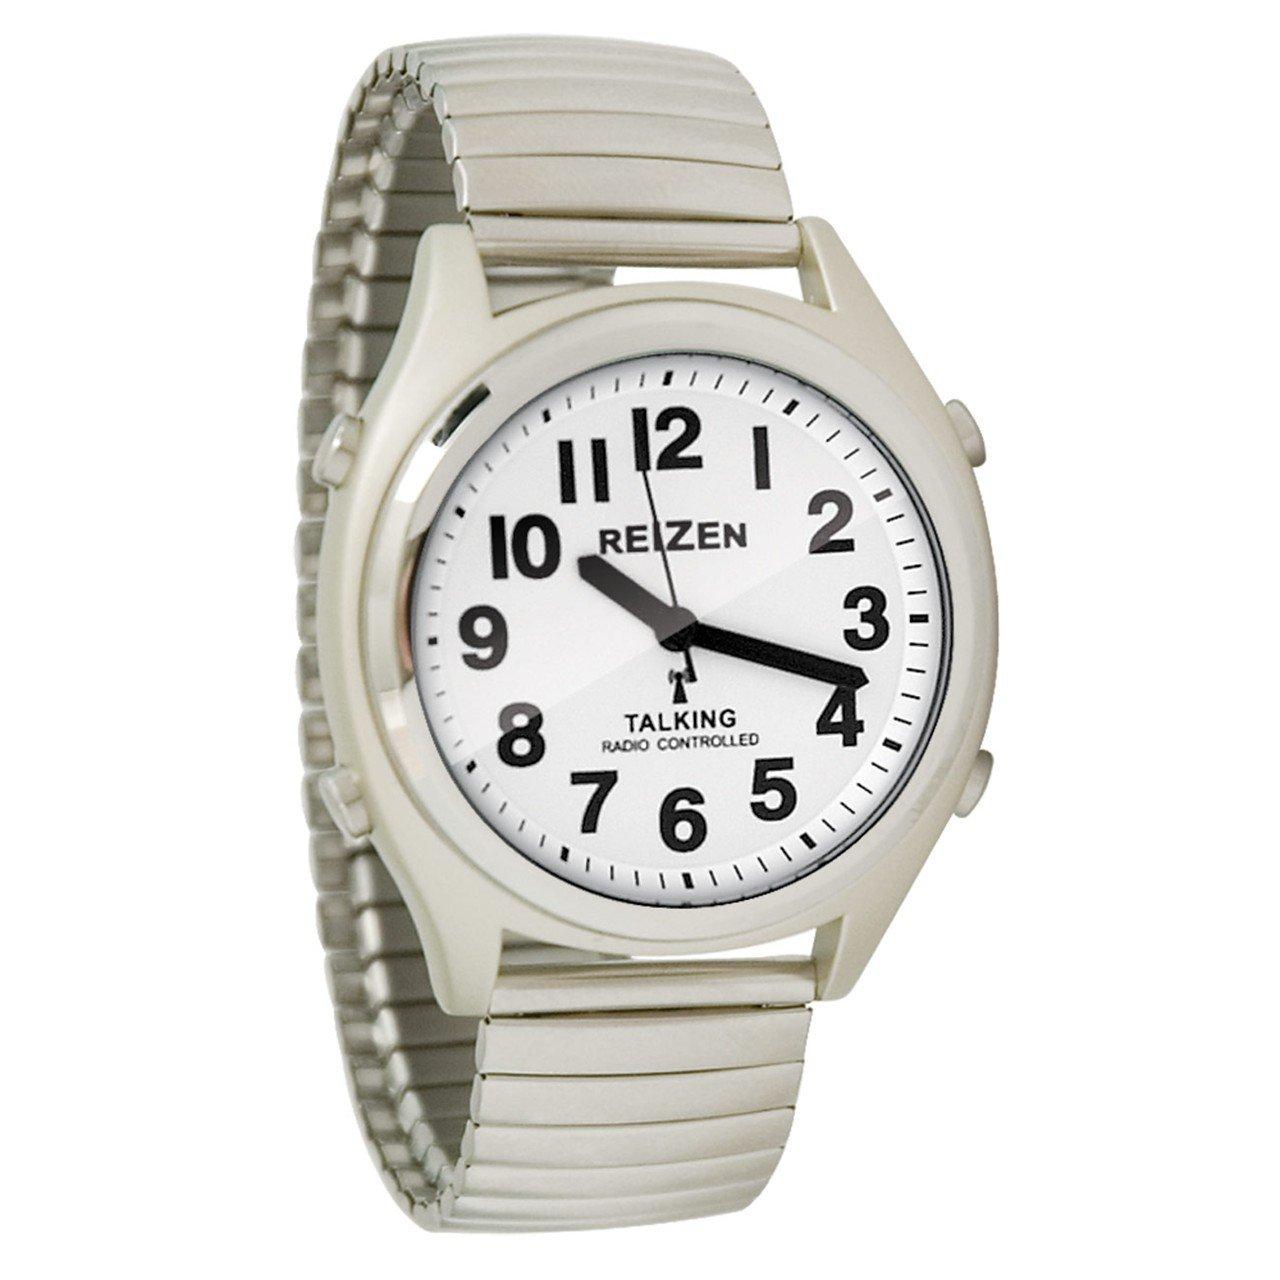 Reizen Talking Atomic Watch - White Face-Black Numbers-Expansion Band